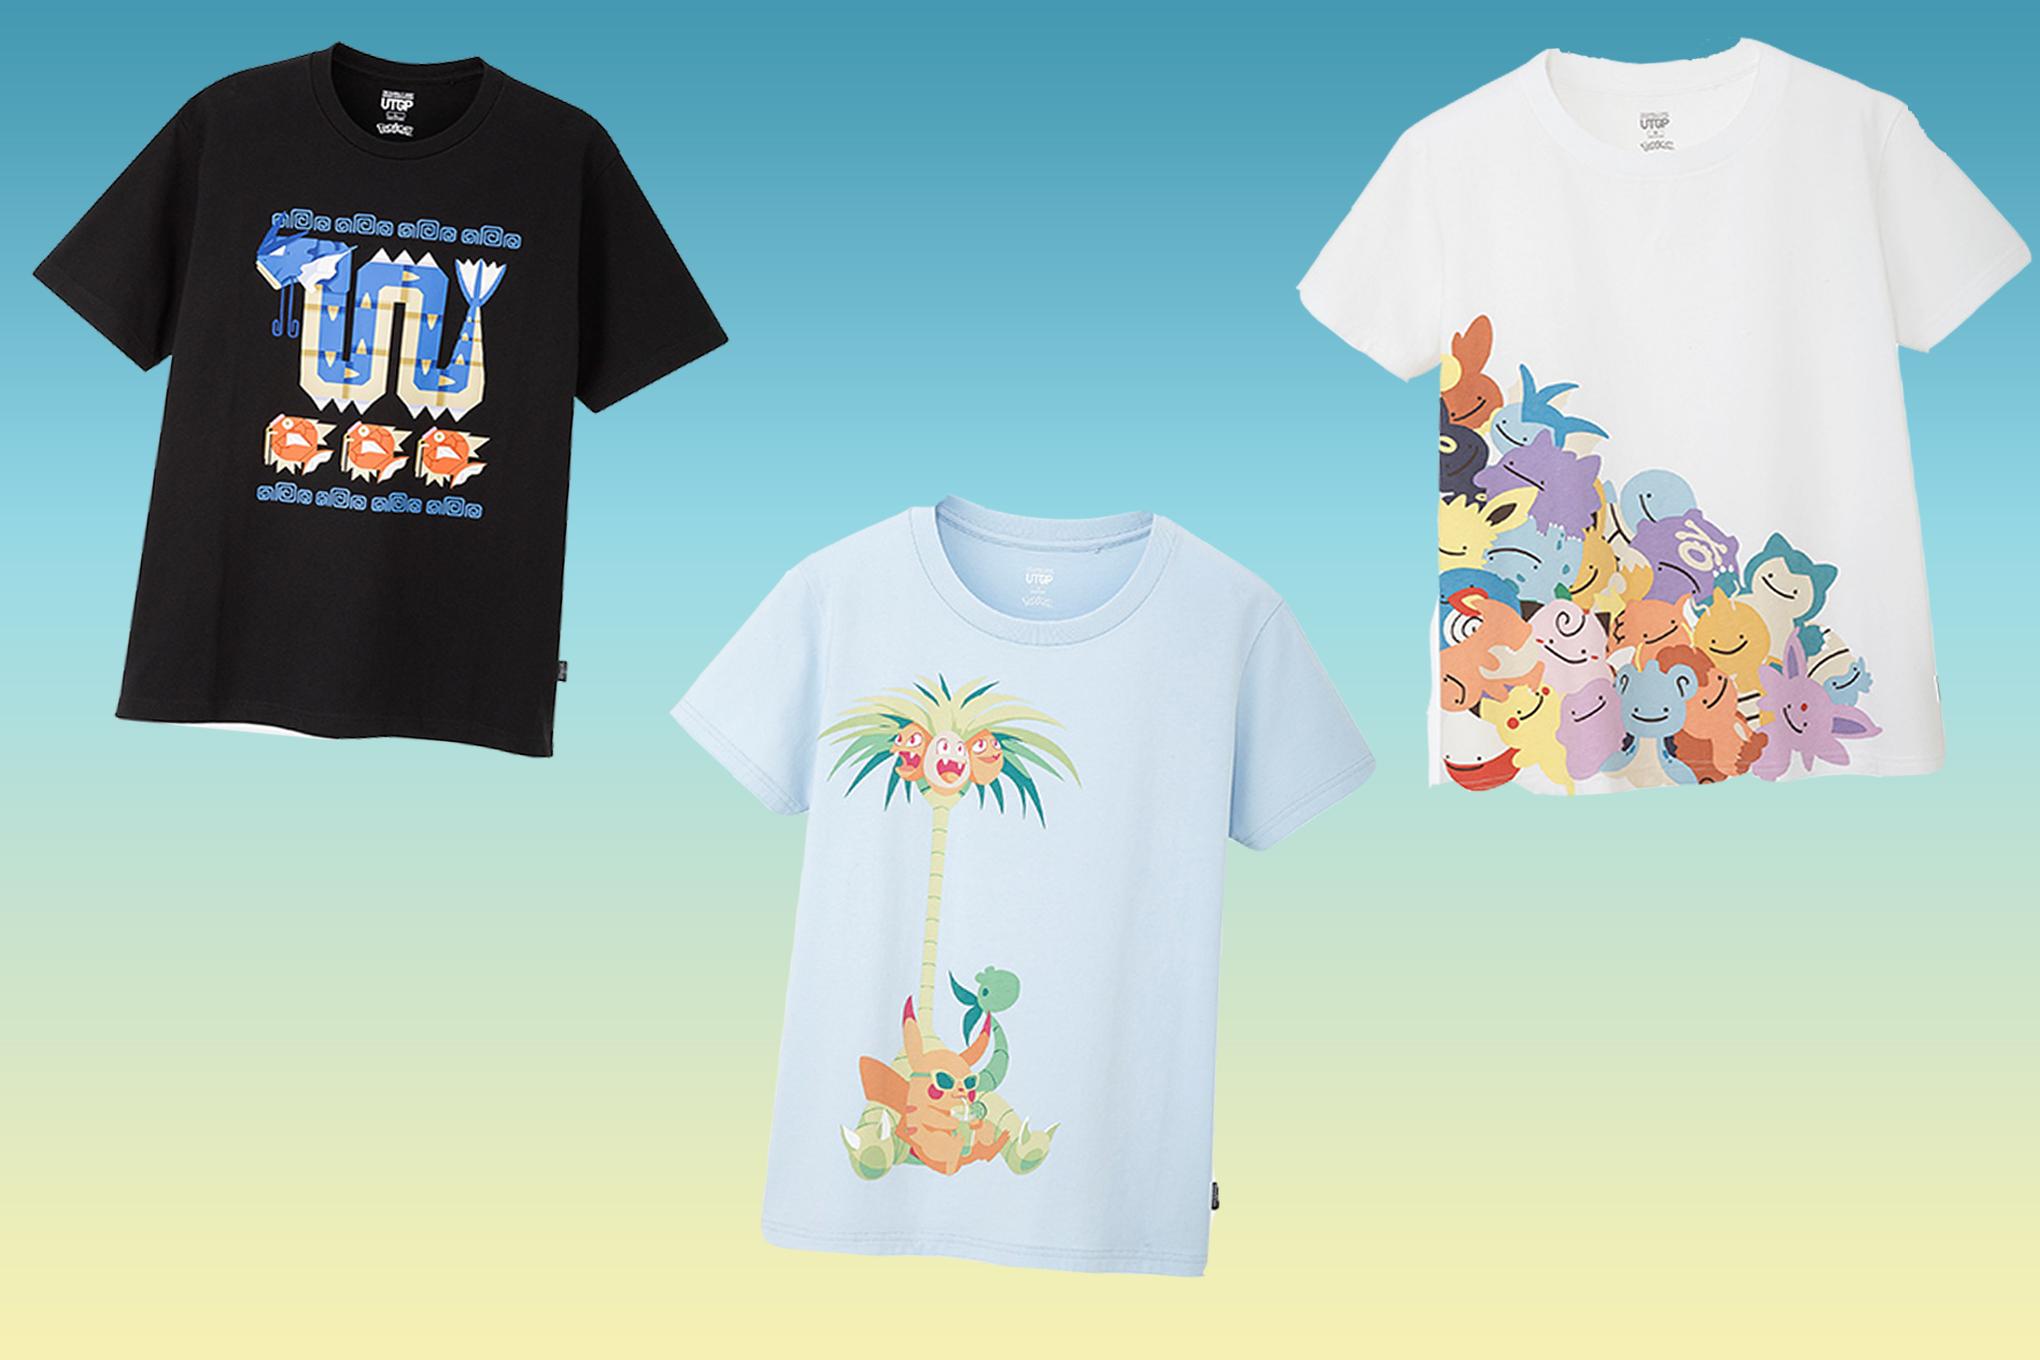 Uniqlo Pokémon T-shirt design contest winners crowned